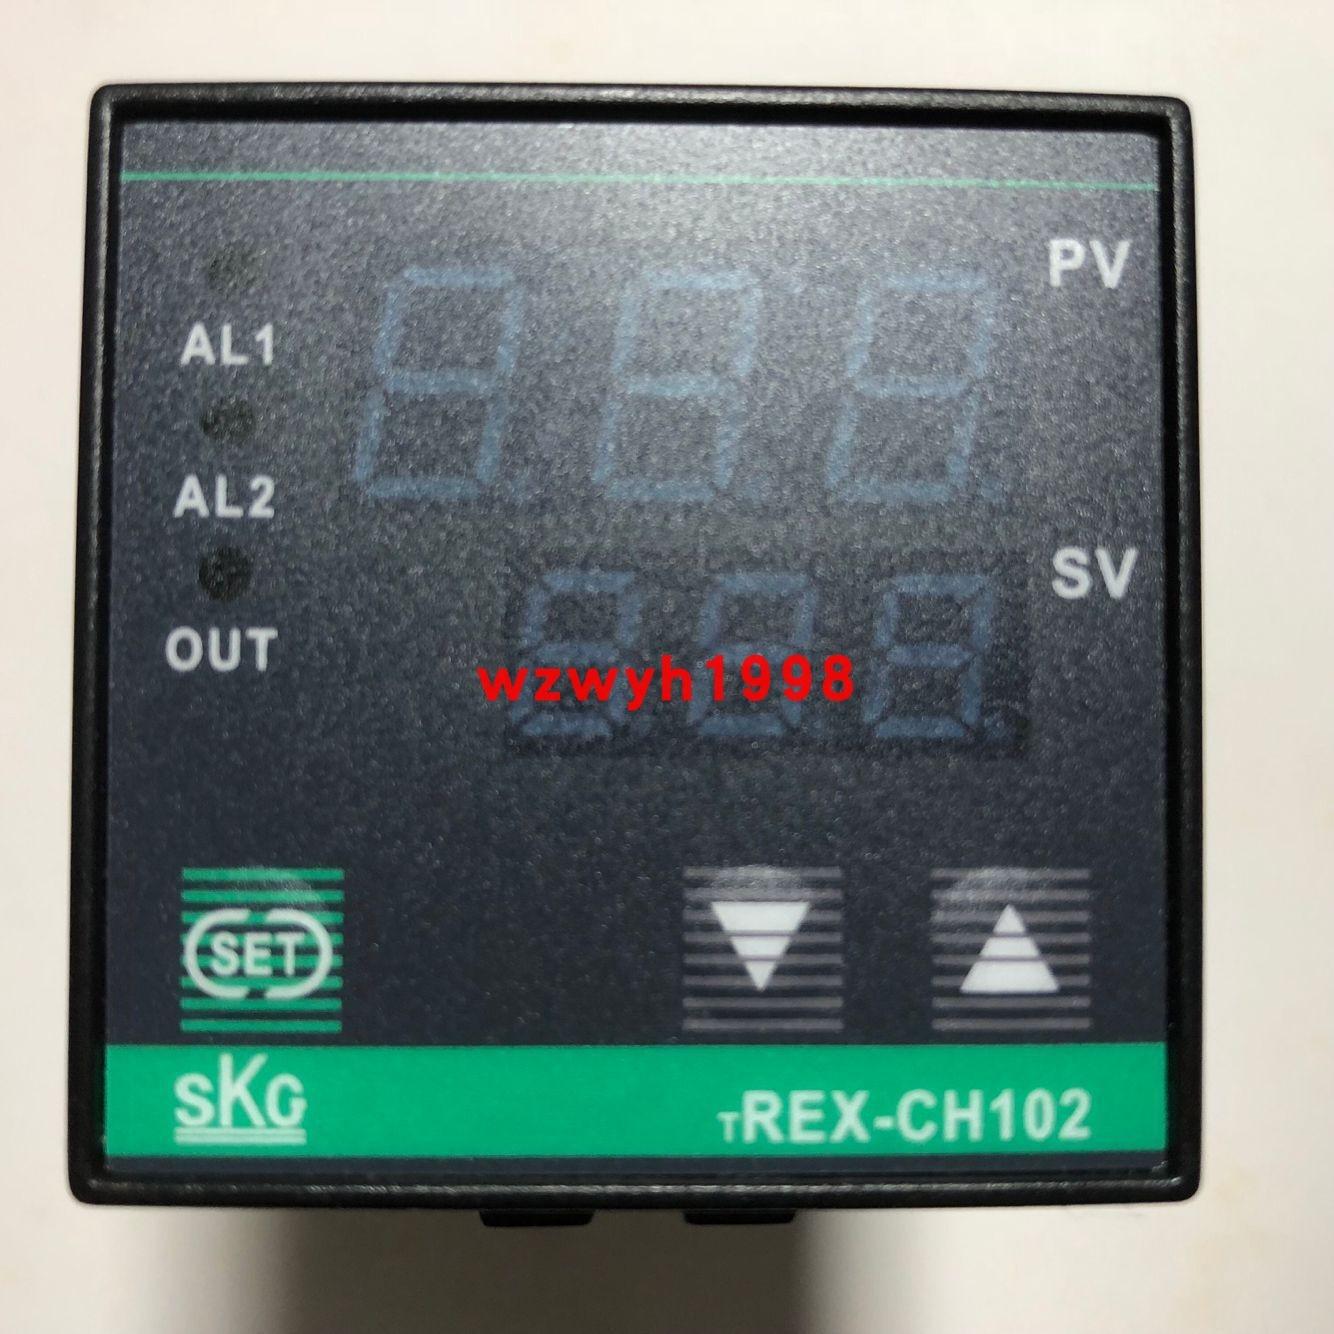 SKG CH102 متحكم في درجة الحرارة SKG TREX-CH102 الذكية متر TREX-CH102FK01-M * BN TREX-CH102FK01-V * BN TREX-CH102FPO1-M